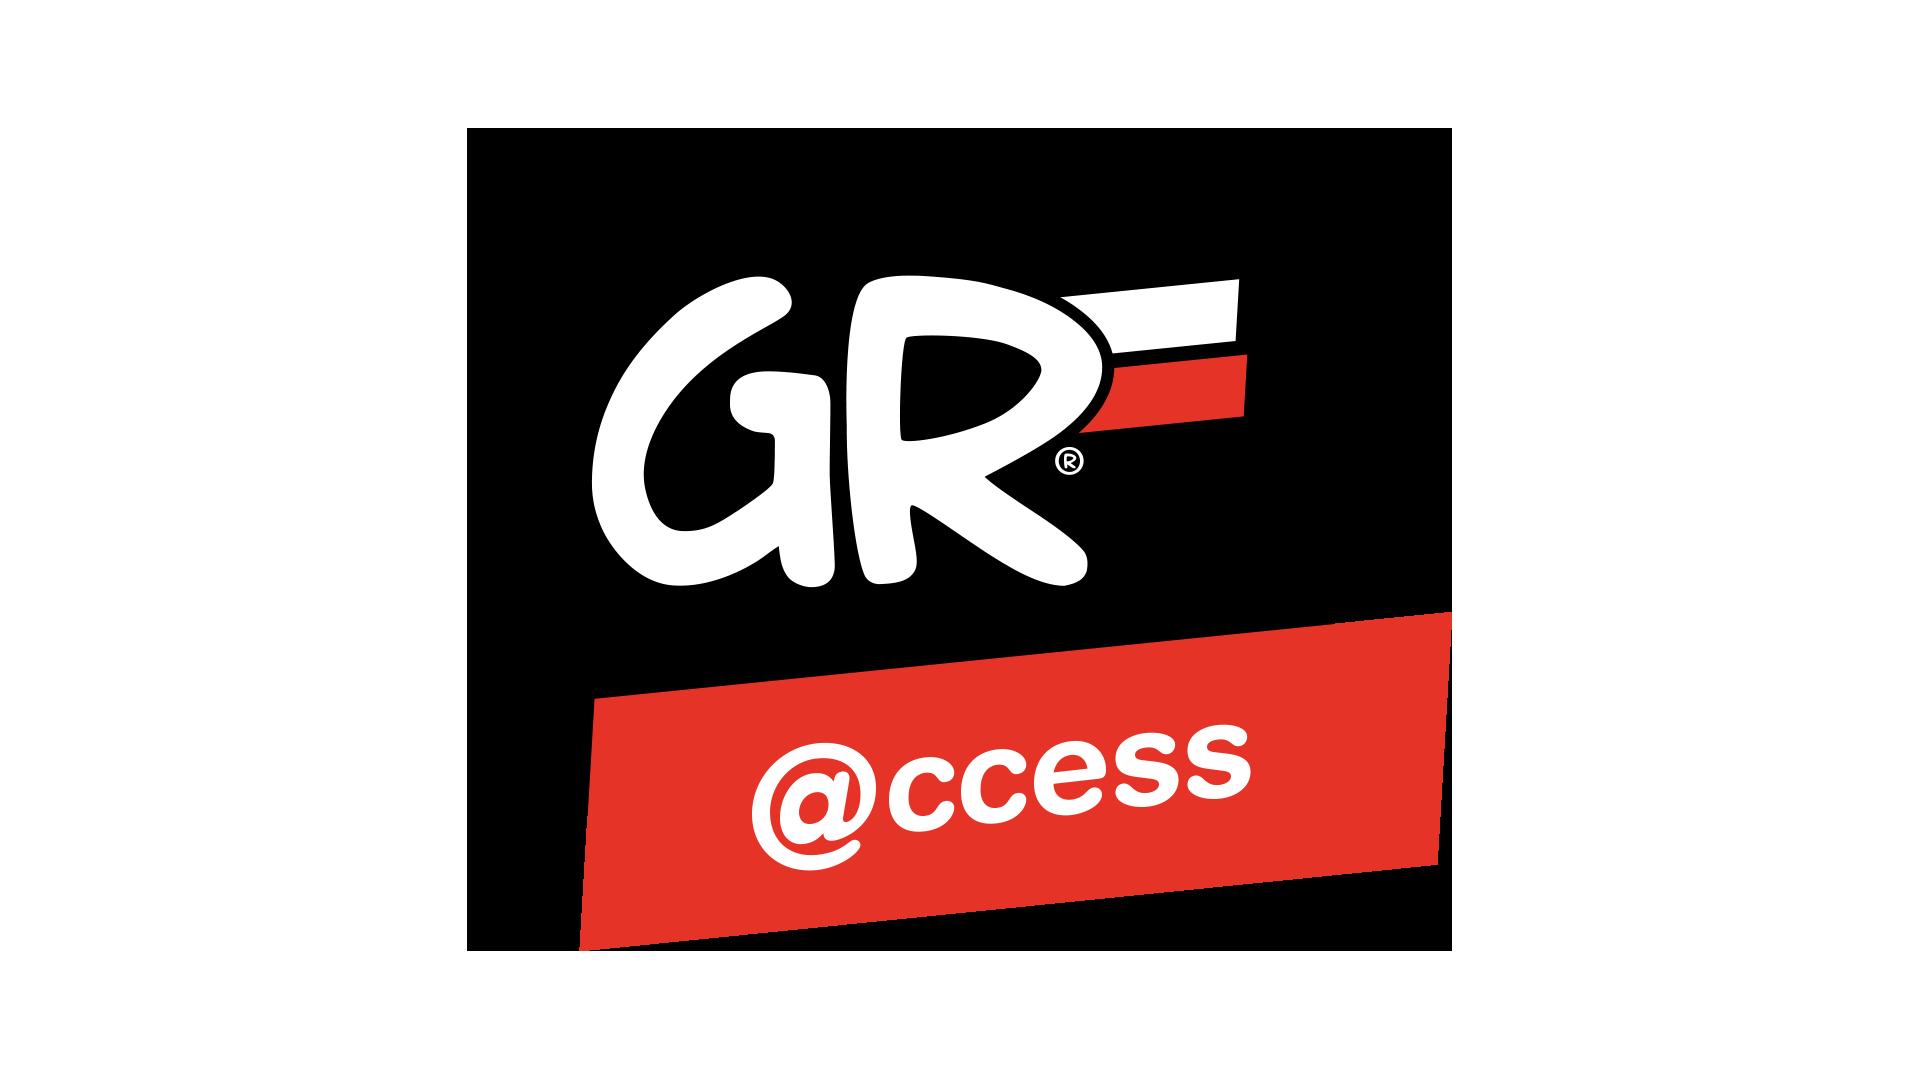 Gr access logo